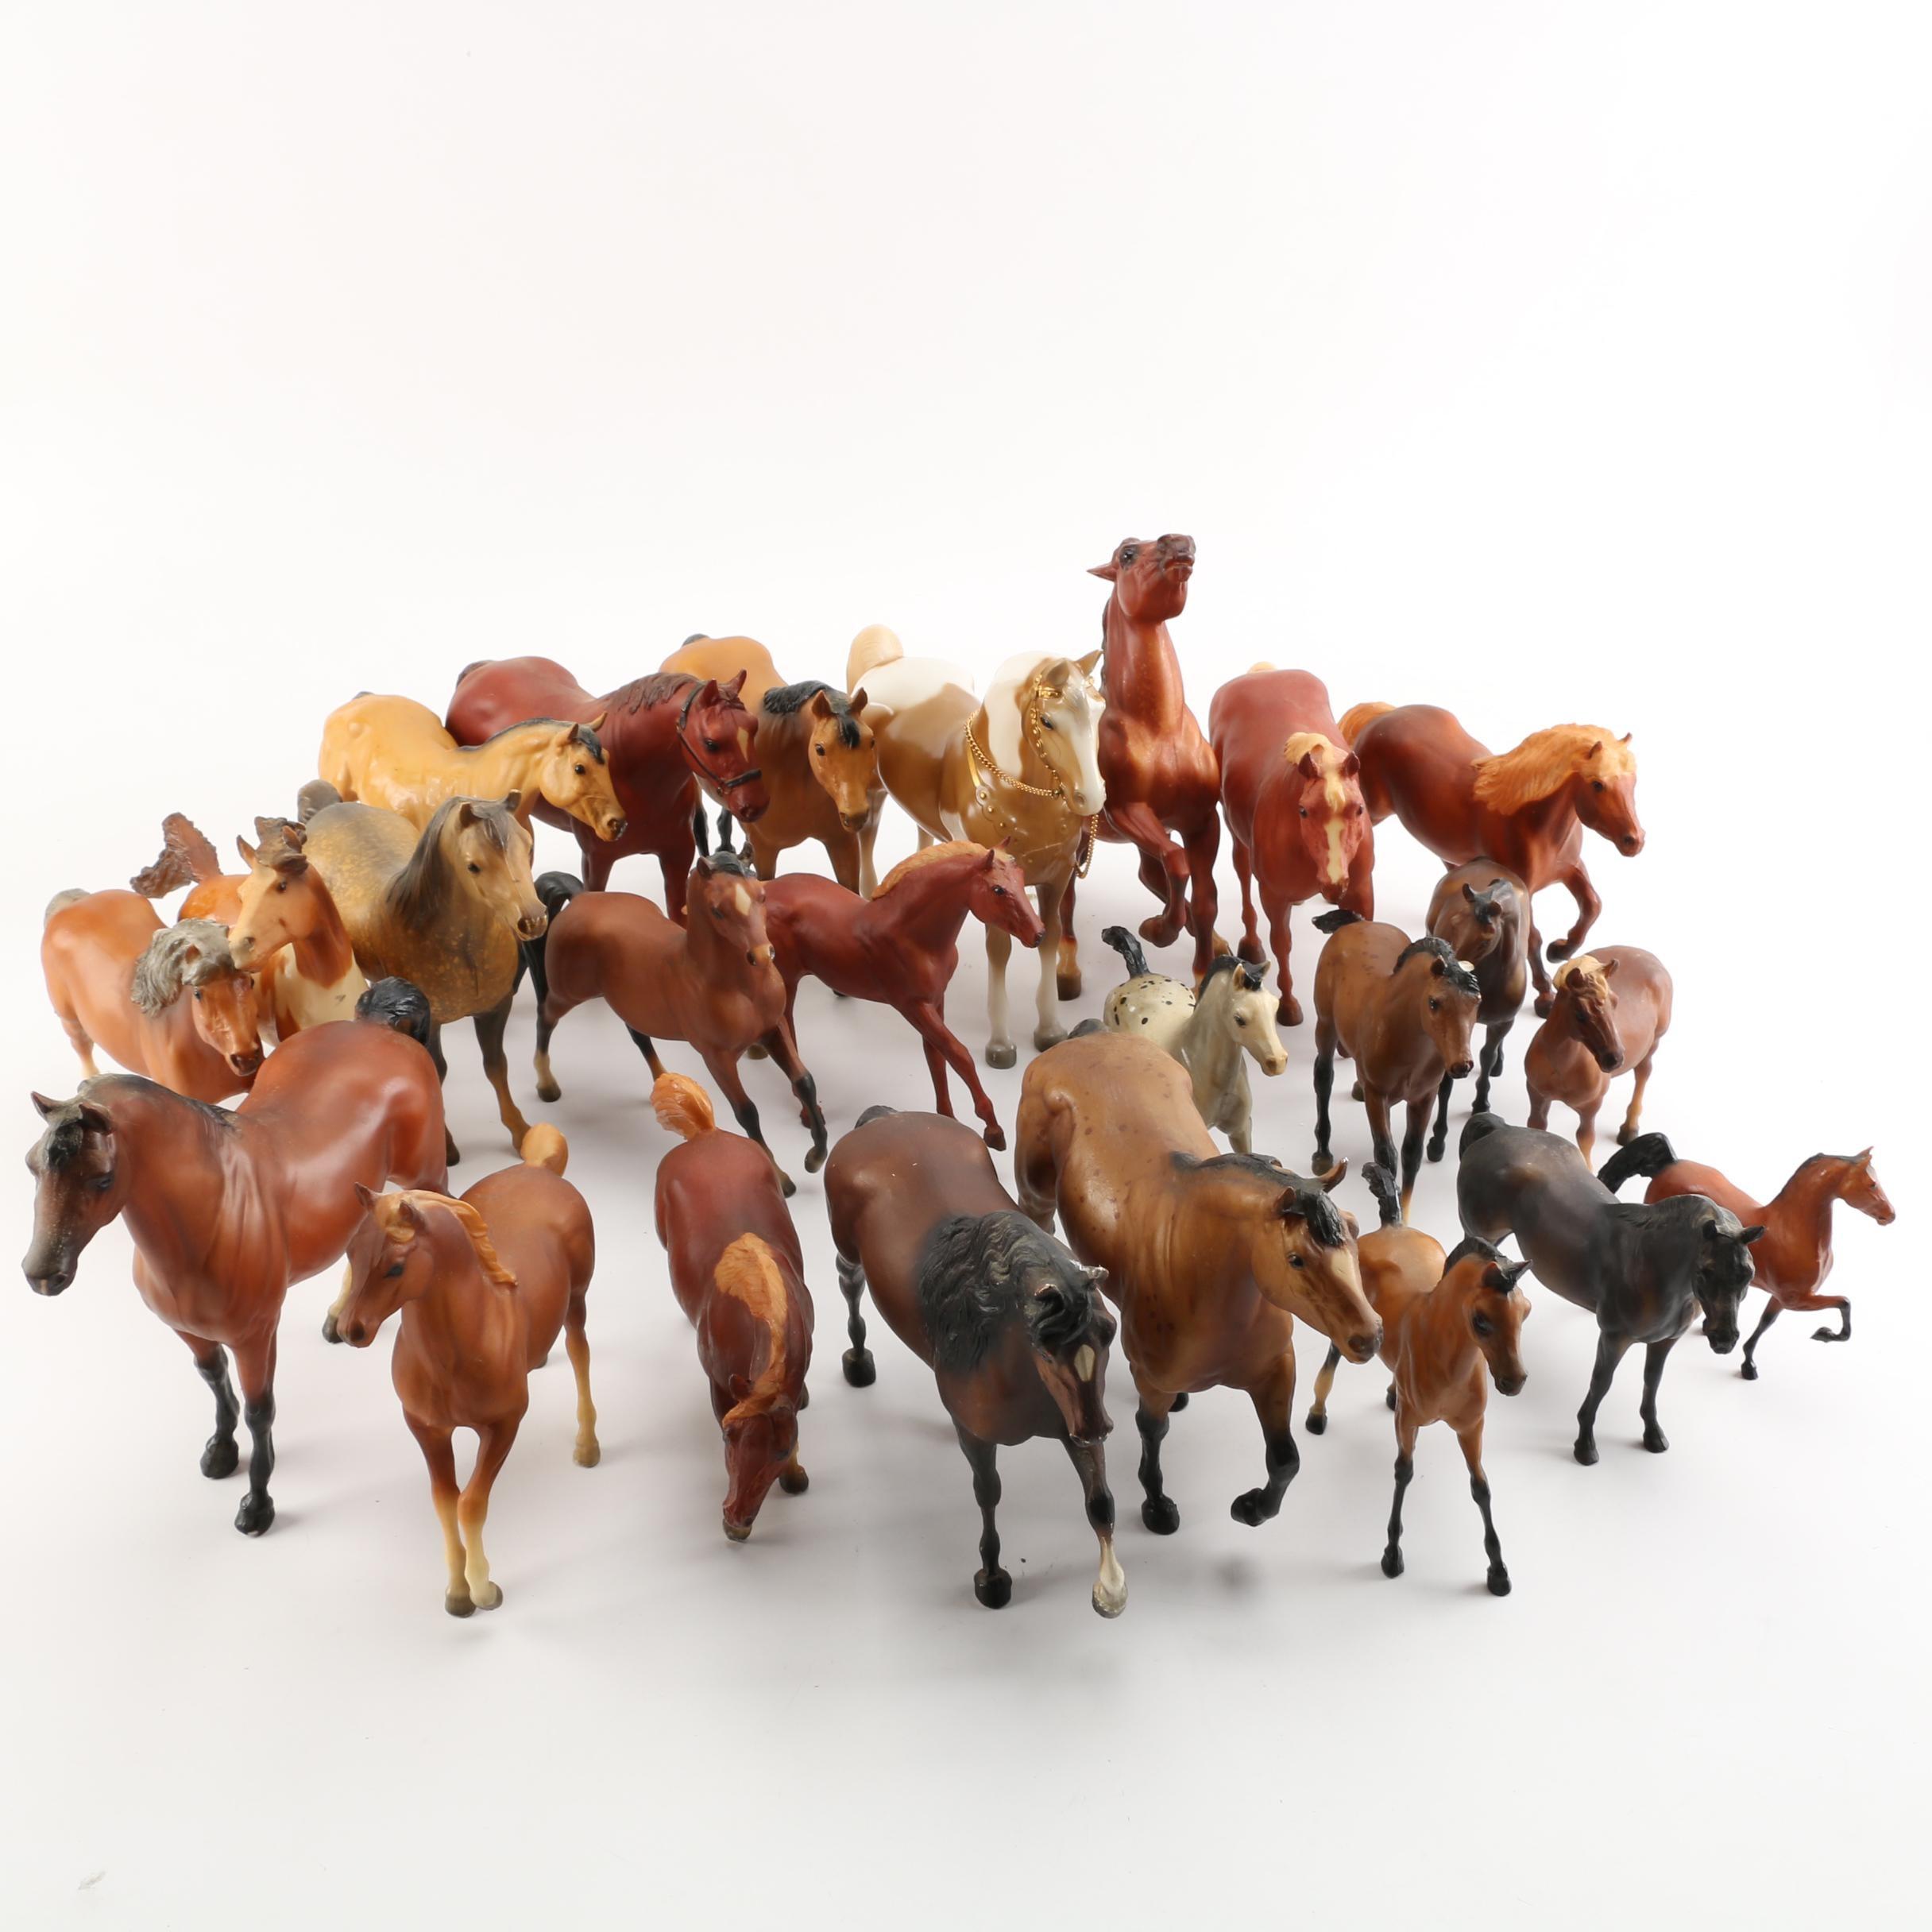 Horse Figurines Featuring Breyer